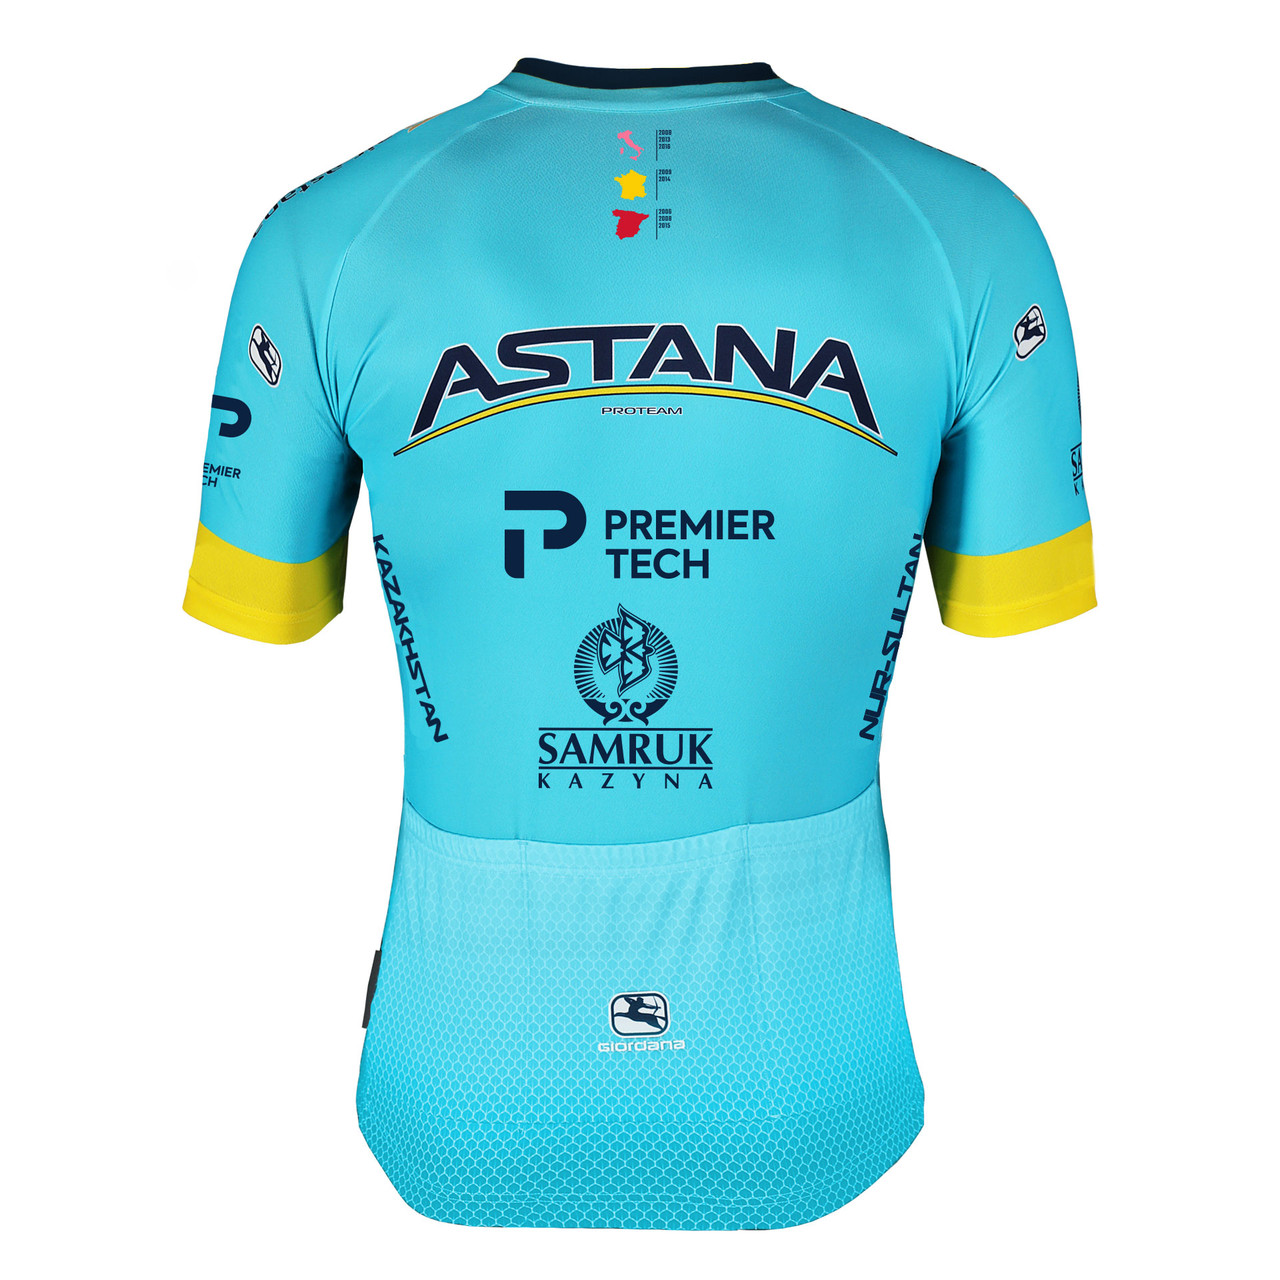 2020 Astana Premier Tech Vero Pro FZ Jersey  Rear